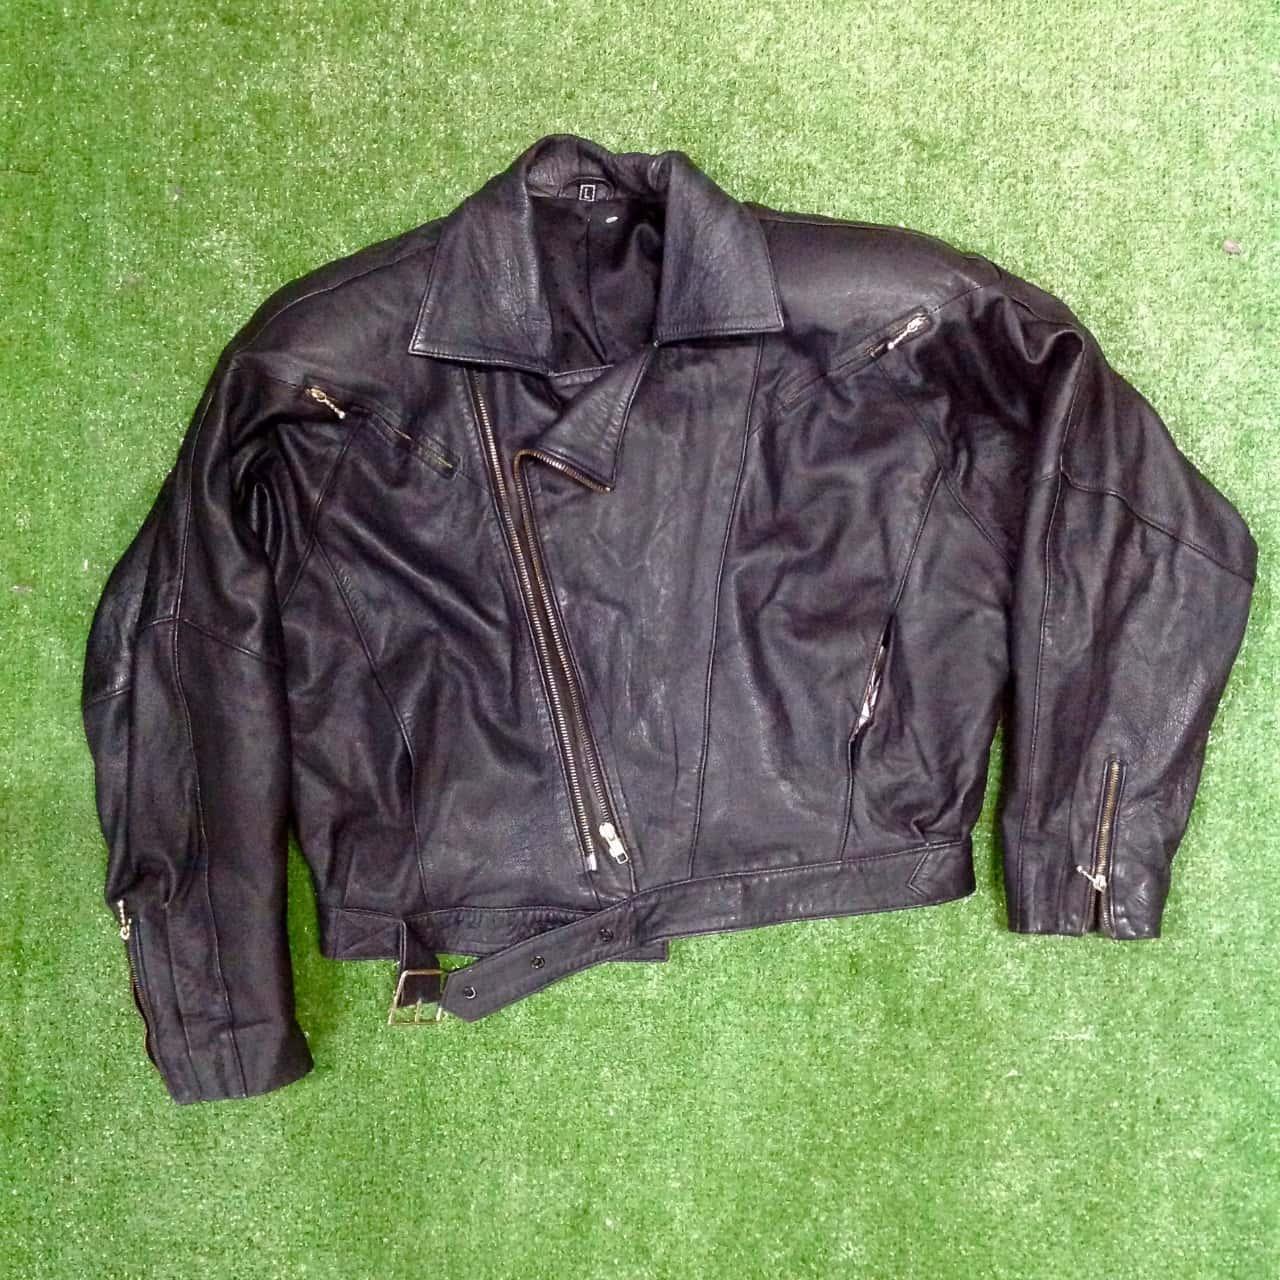 Womens  Size L/ 10/12 leather Biker Jacket Black